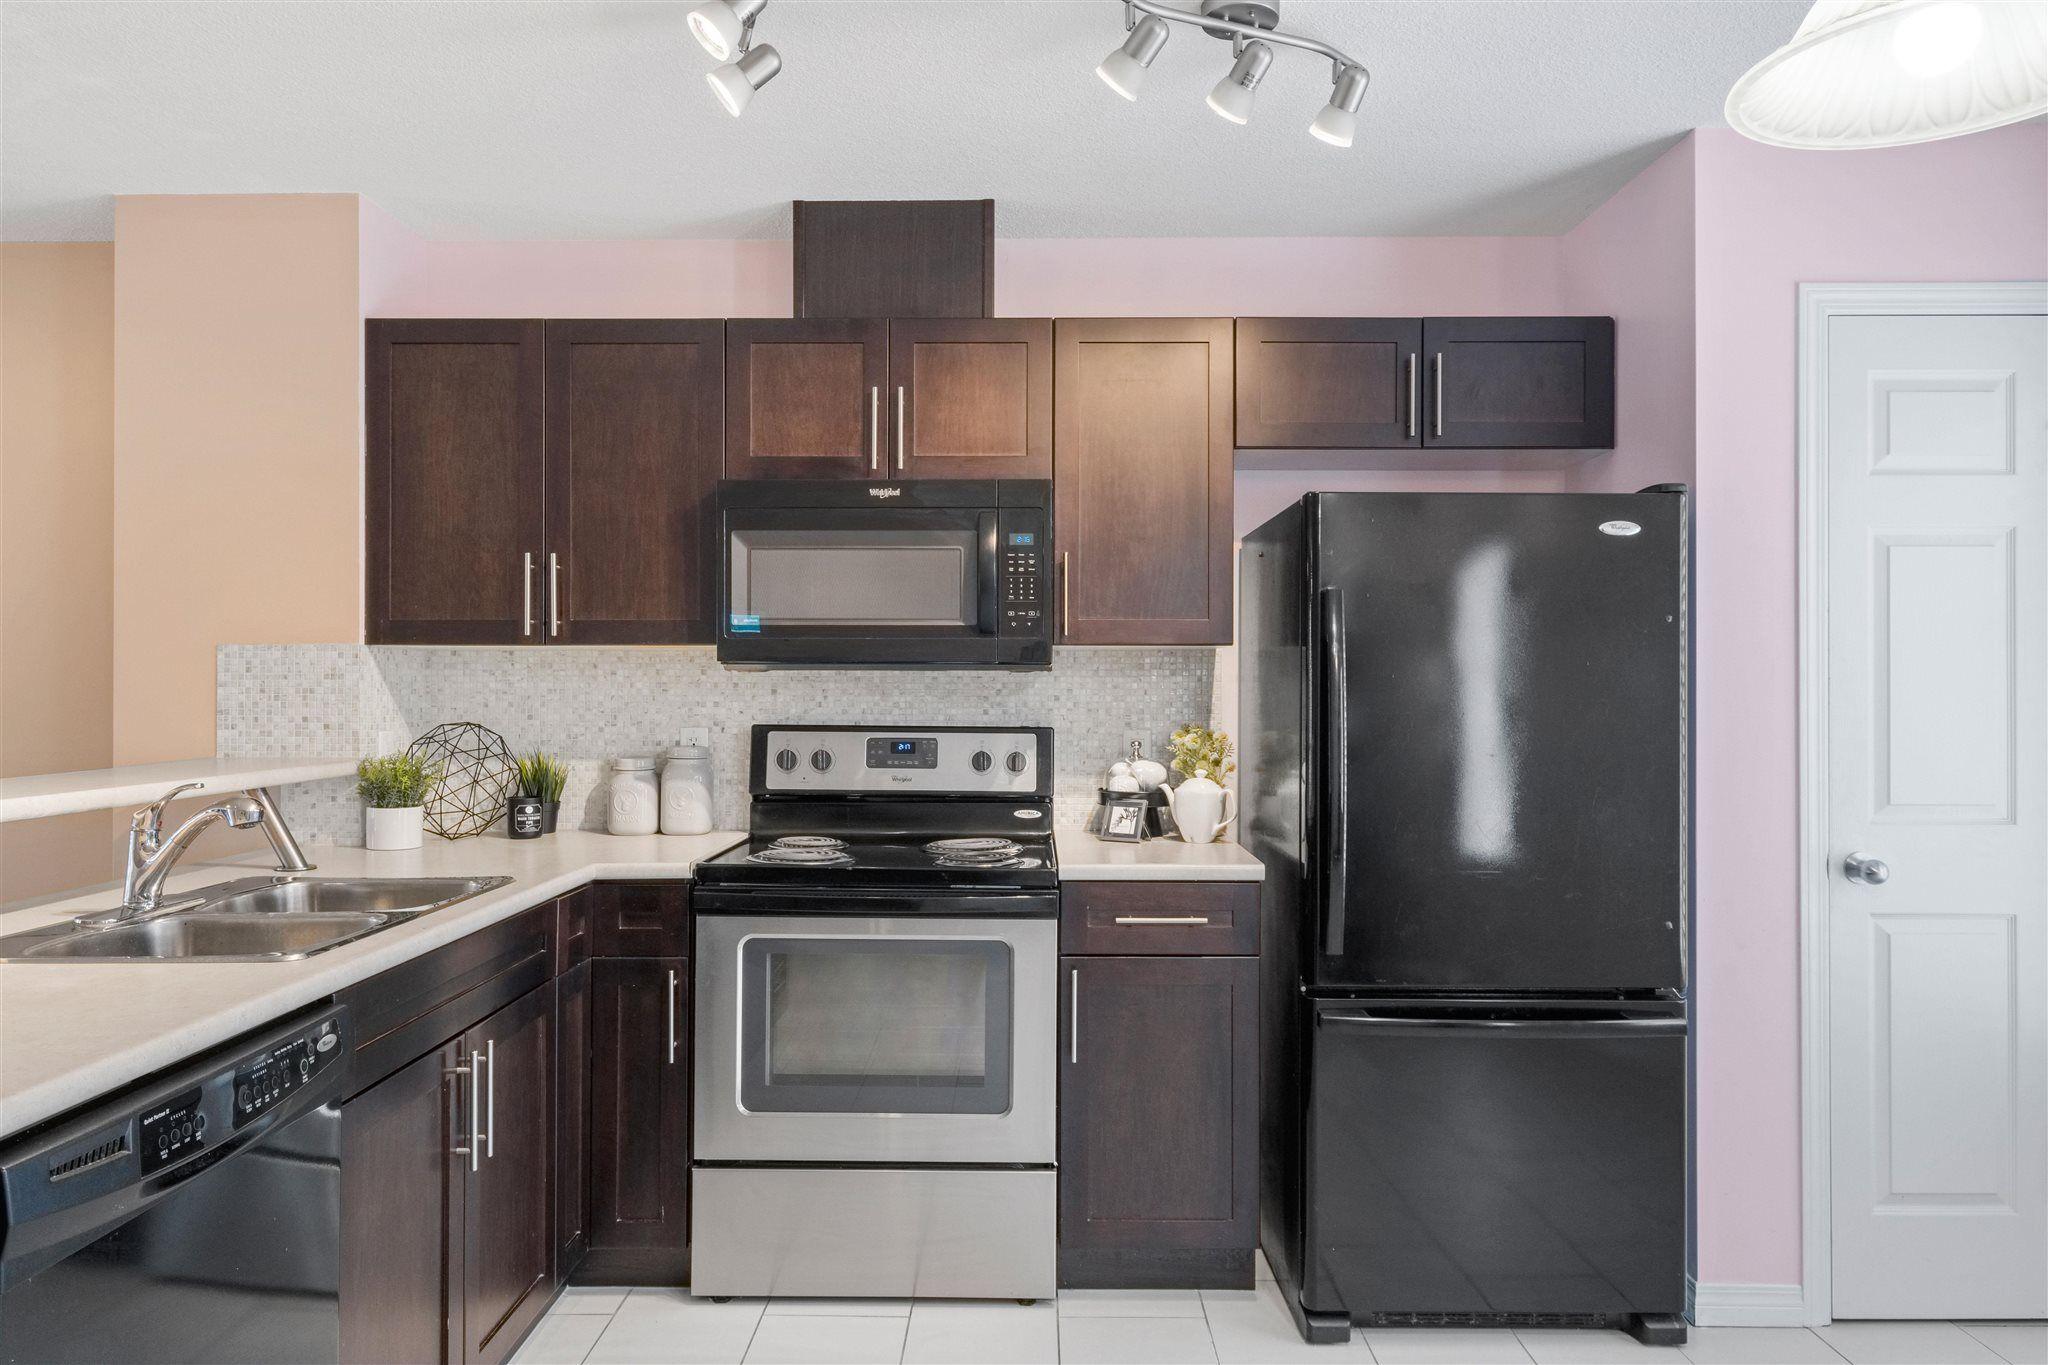 Main Photo: 4874 TERWILLEGAR Common in Edmonton: Zone 14 Townhouse for sale : MLS®# E4257615